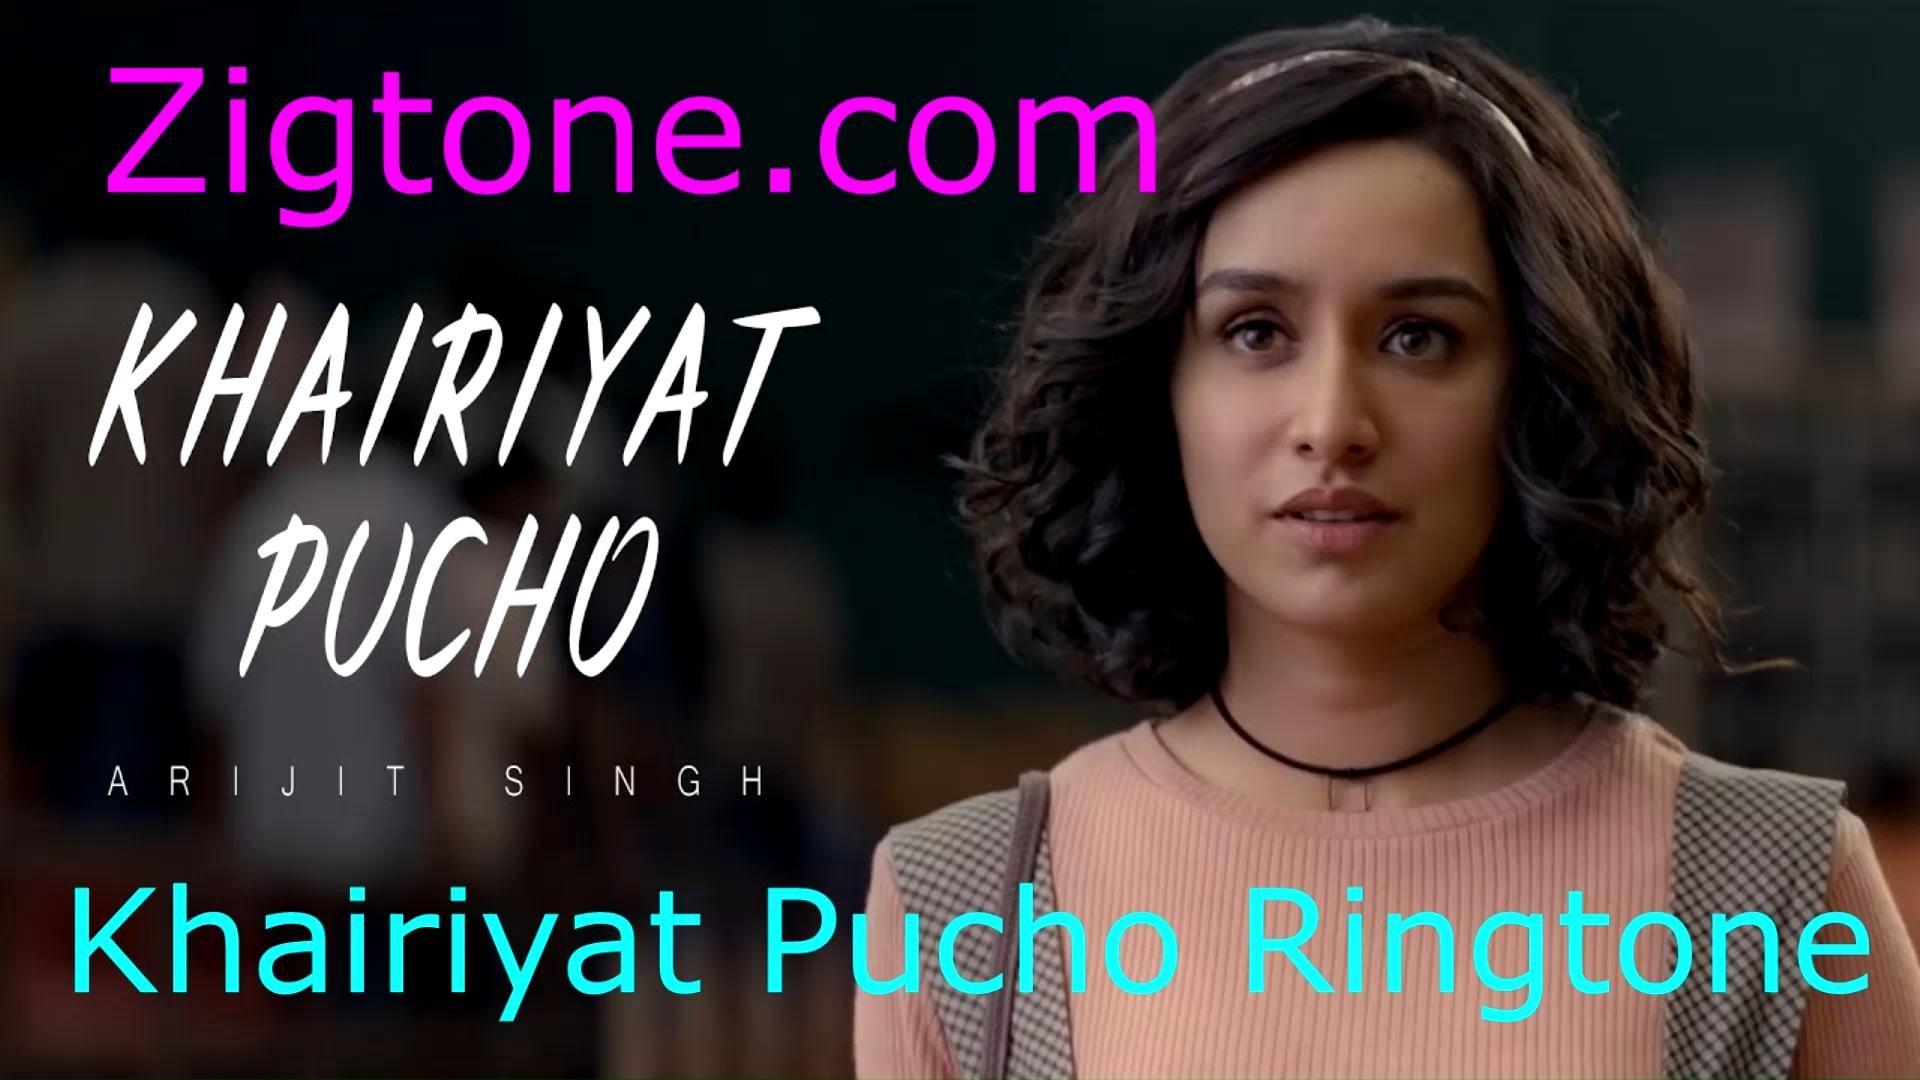 Video Khairiyat Pucho Mobile Ringtone Zigtone Di 2020